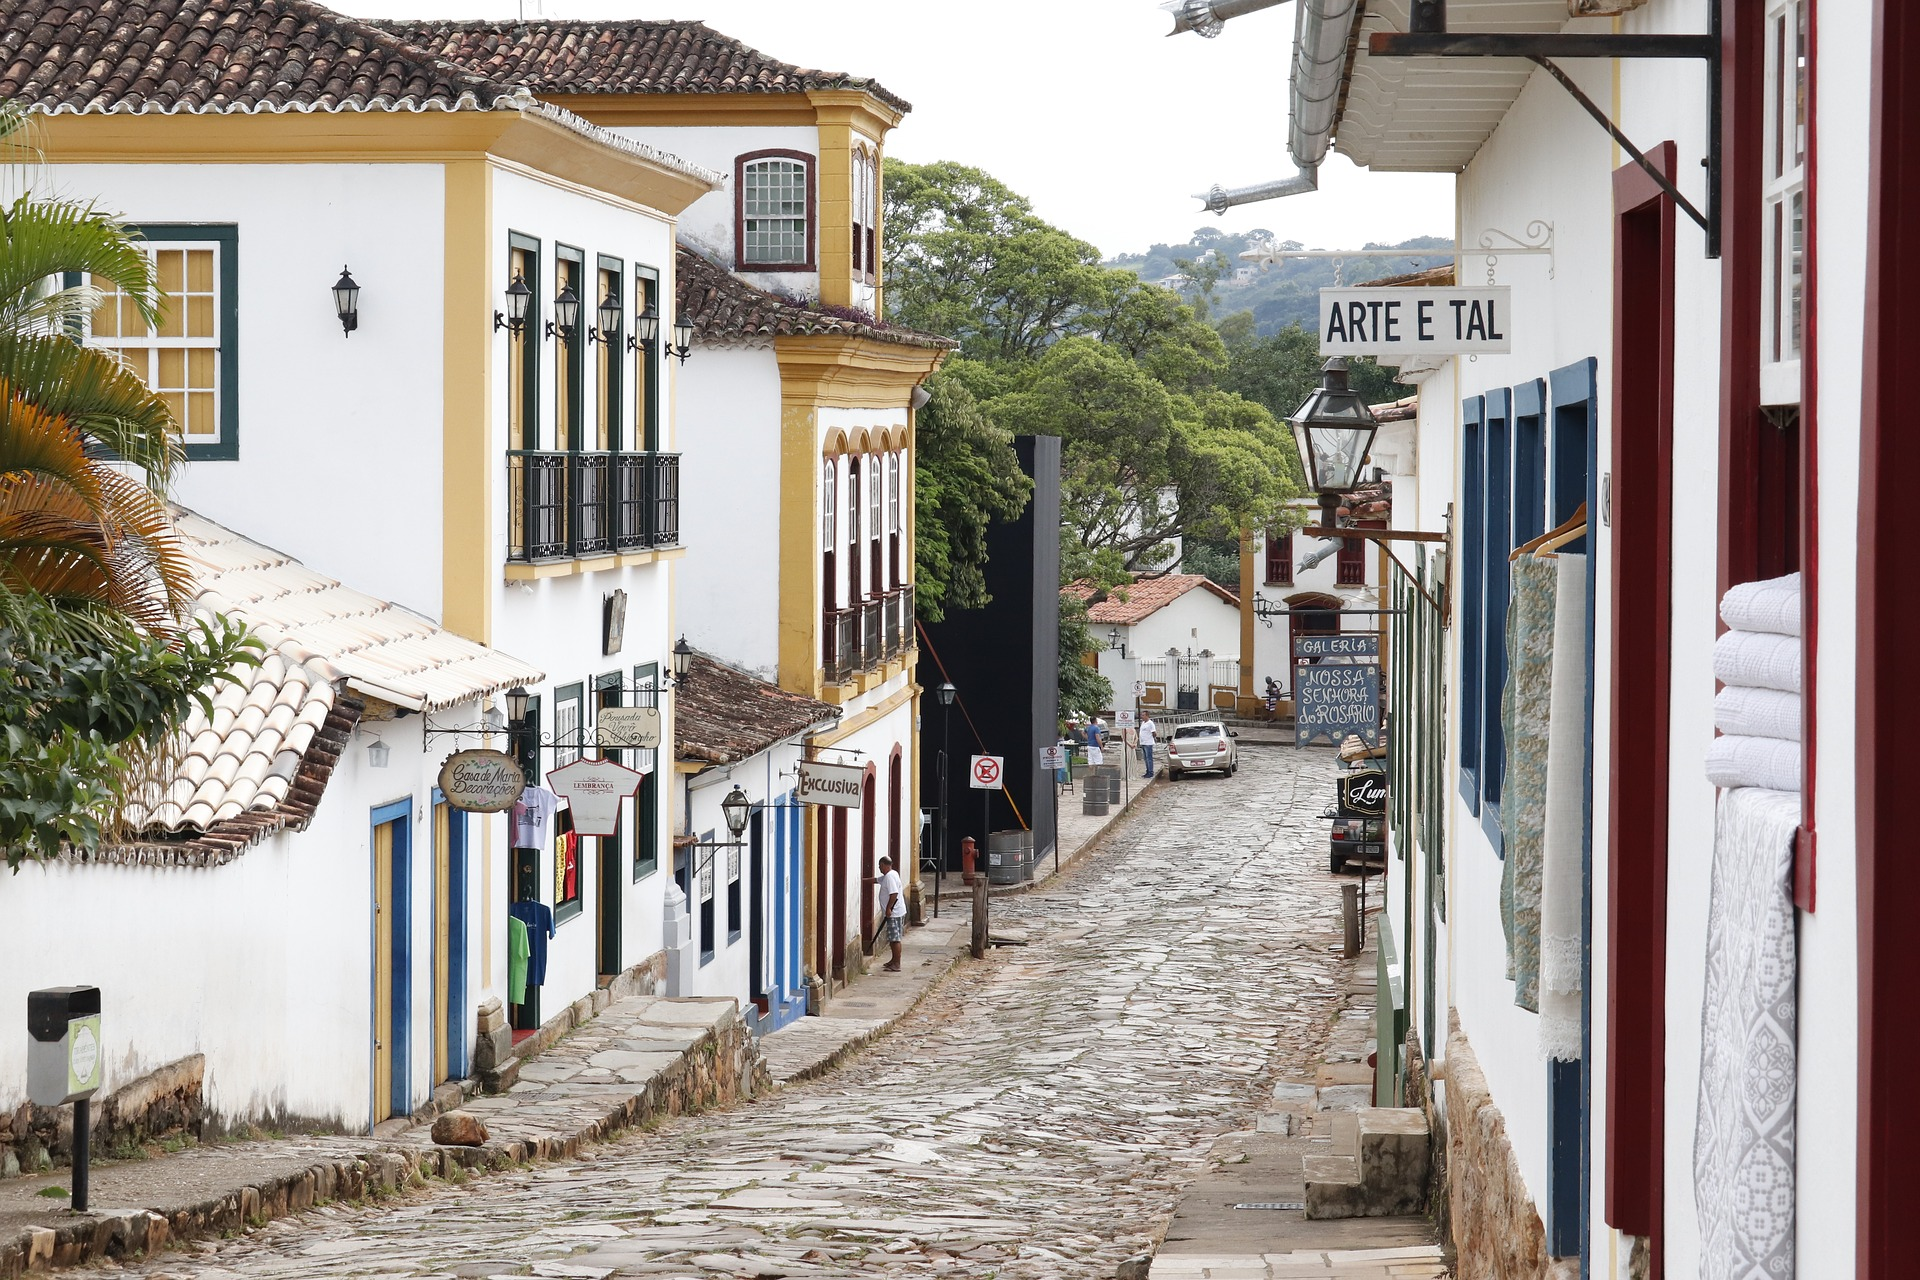 Varzelândia - Minas Gerais